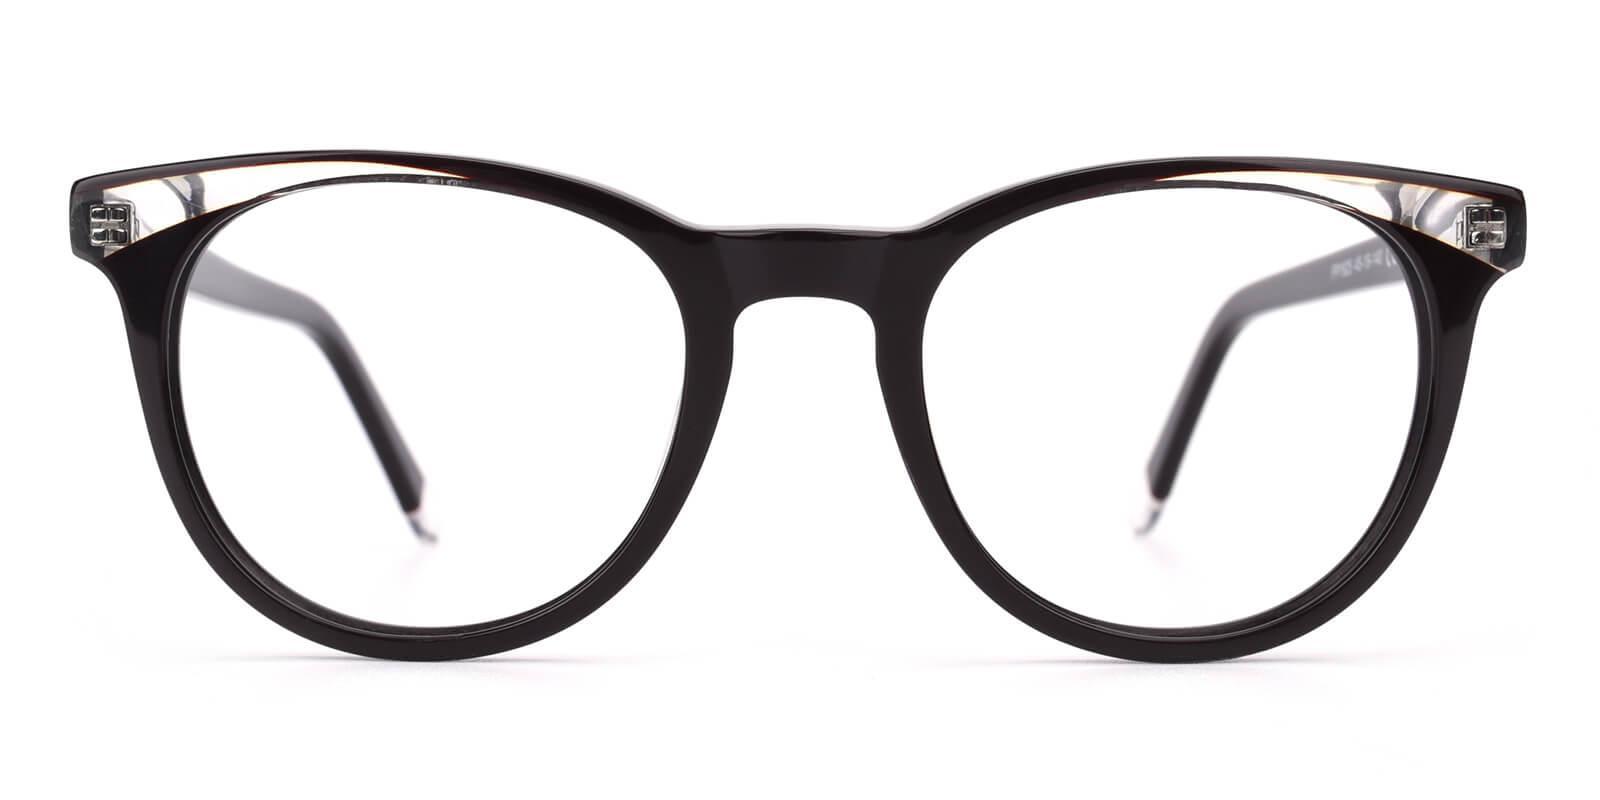 Clementine-Black-Round-Acetate-Eyeglasses-detail